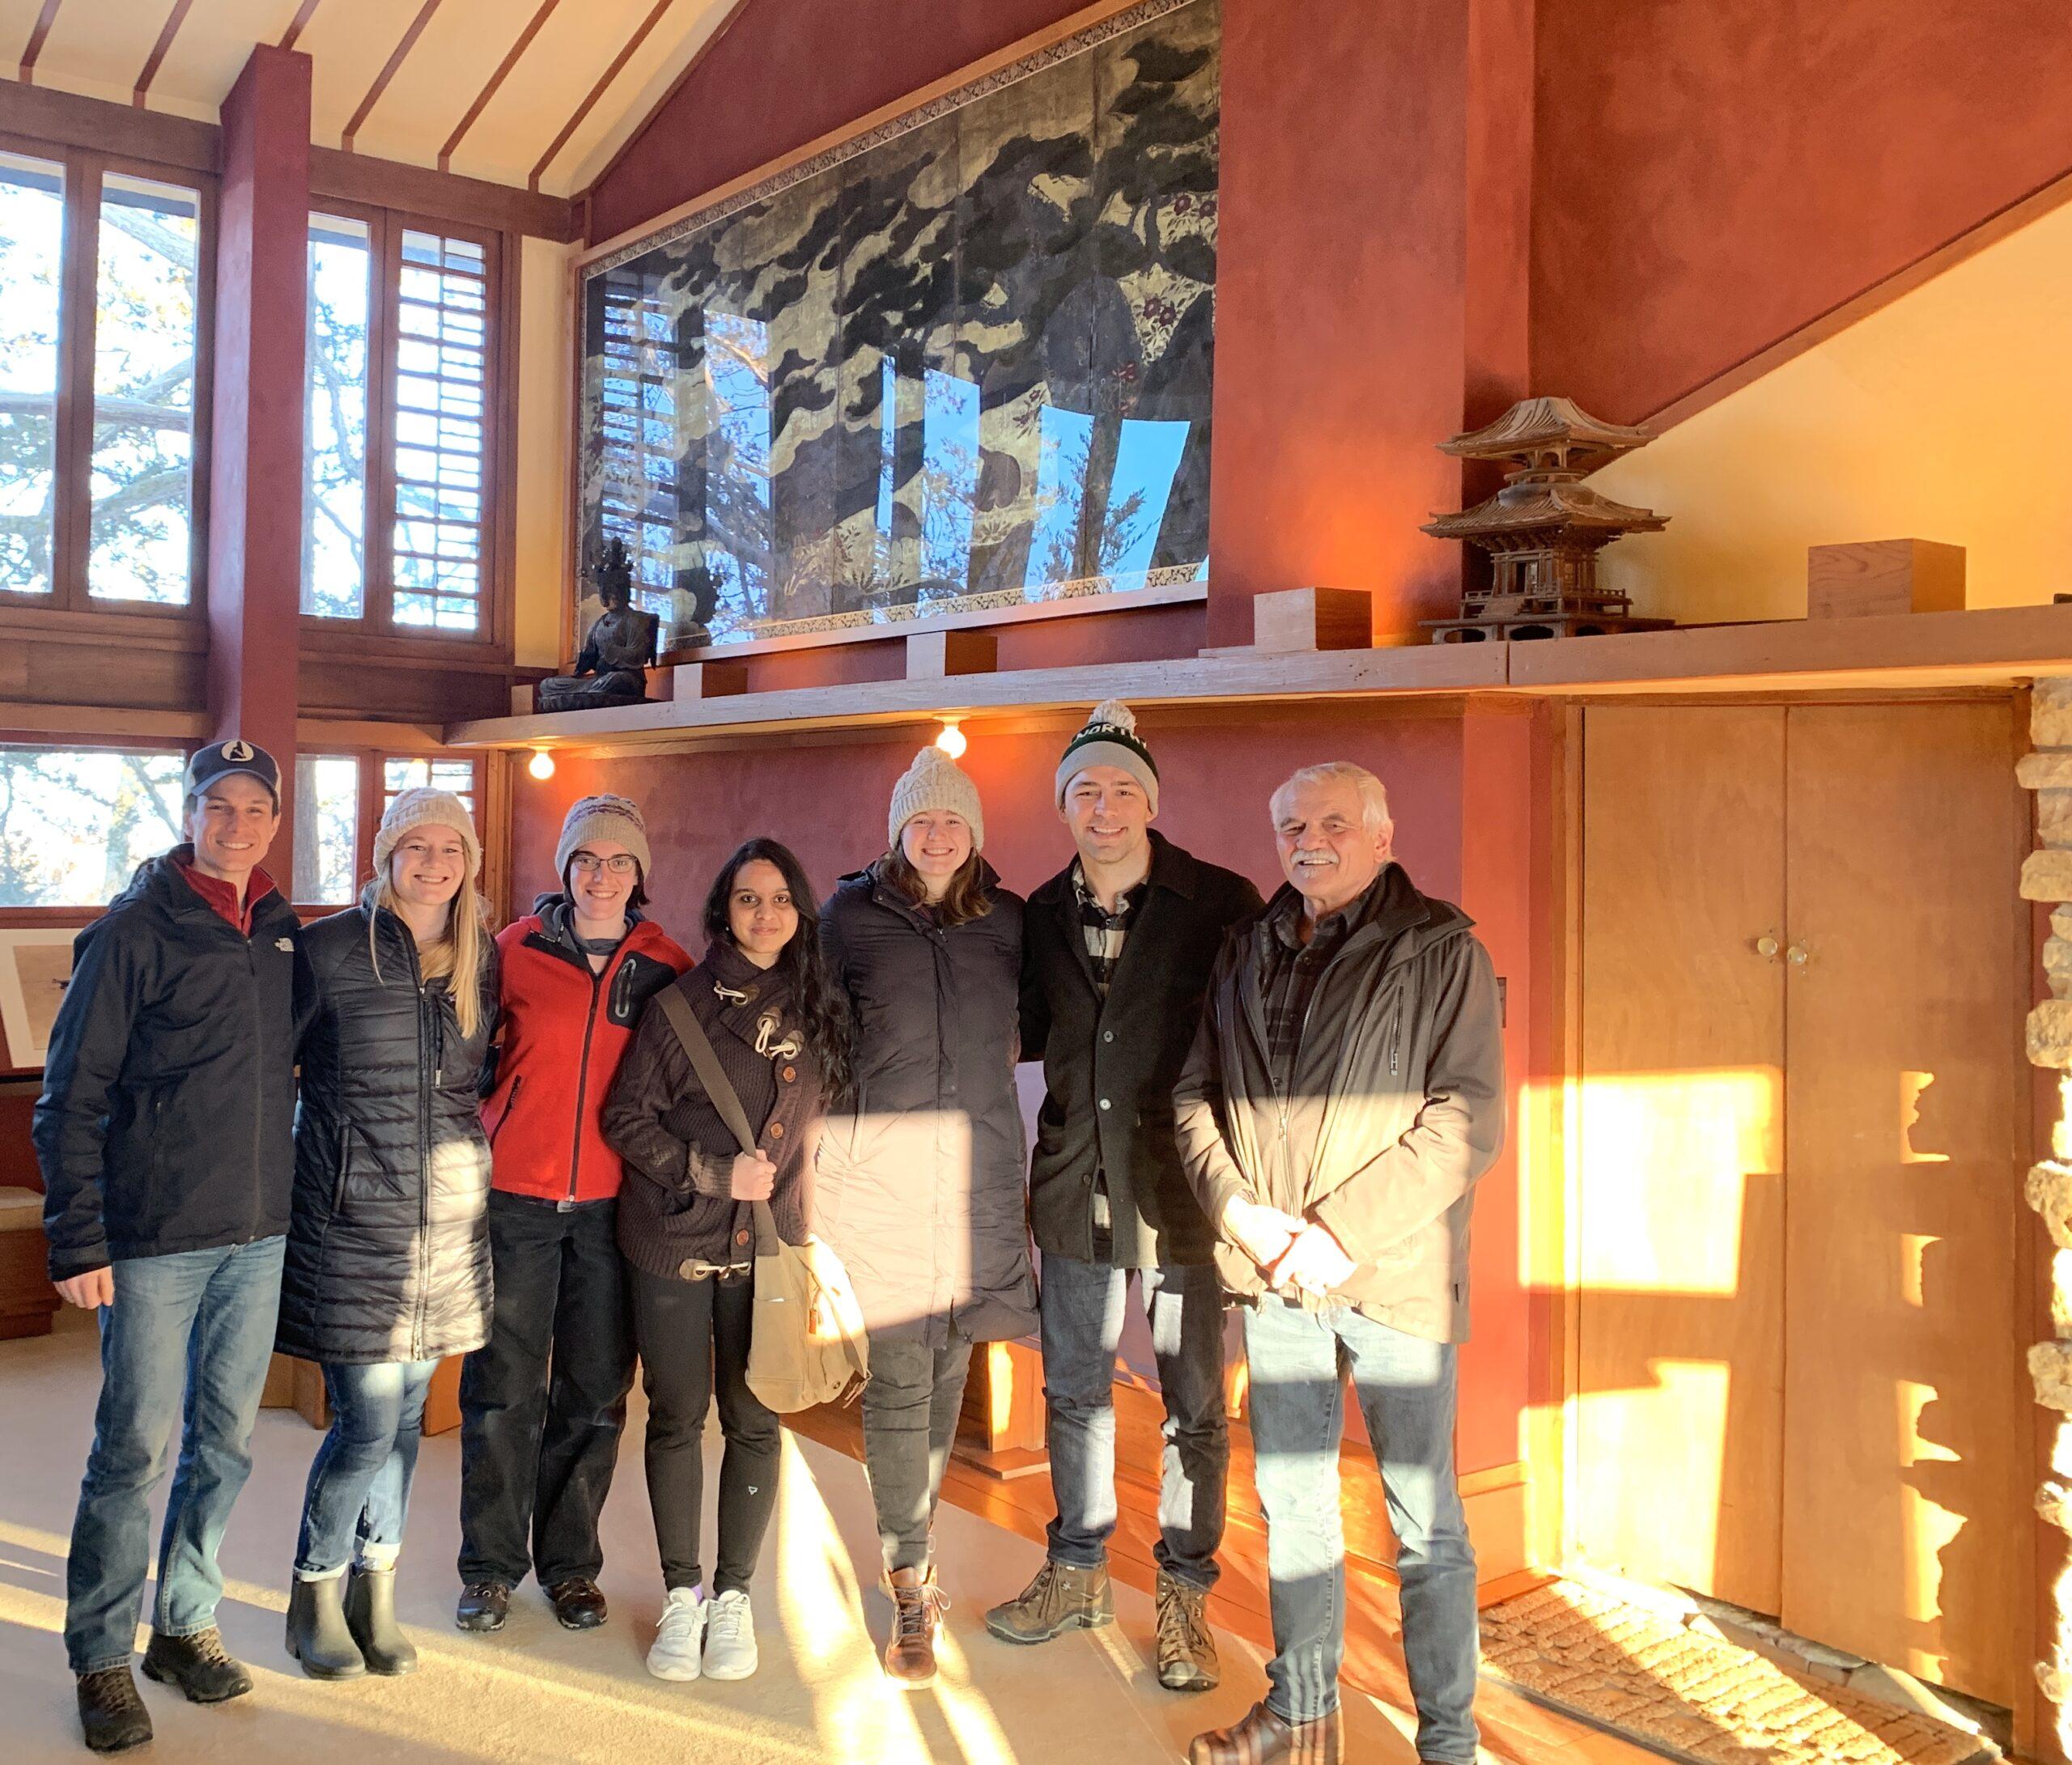 Harvard Visit to Taliesin, Jahn Research Group, Molly Jahn